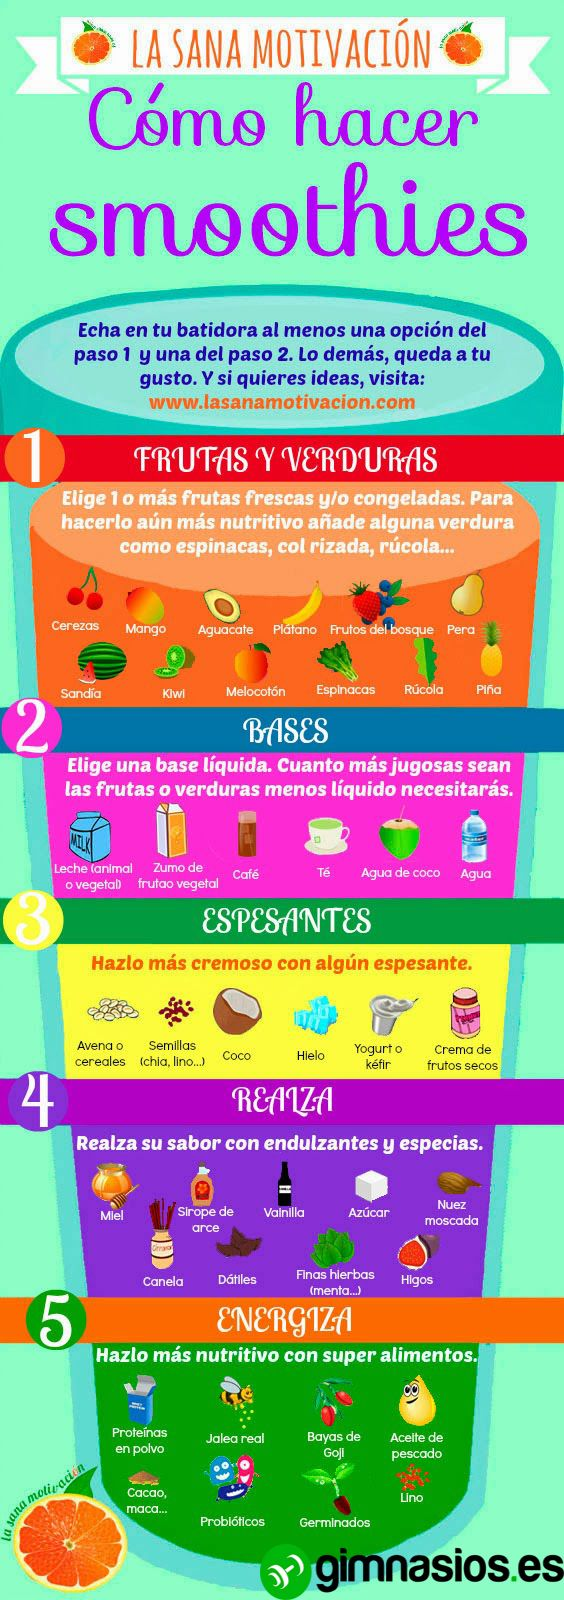 #comohacer #smoothie #fruta #buenisimo #energia #receta